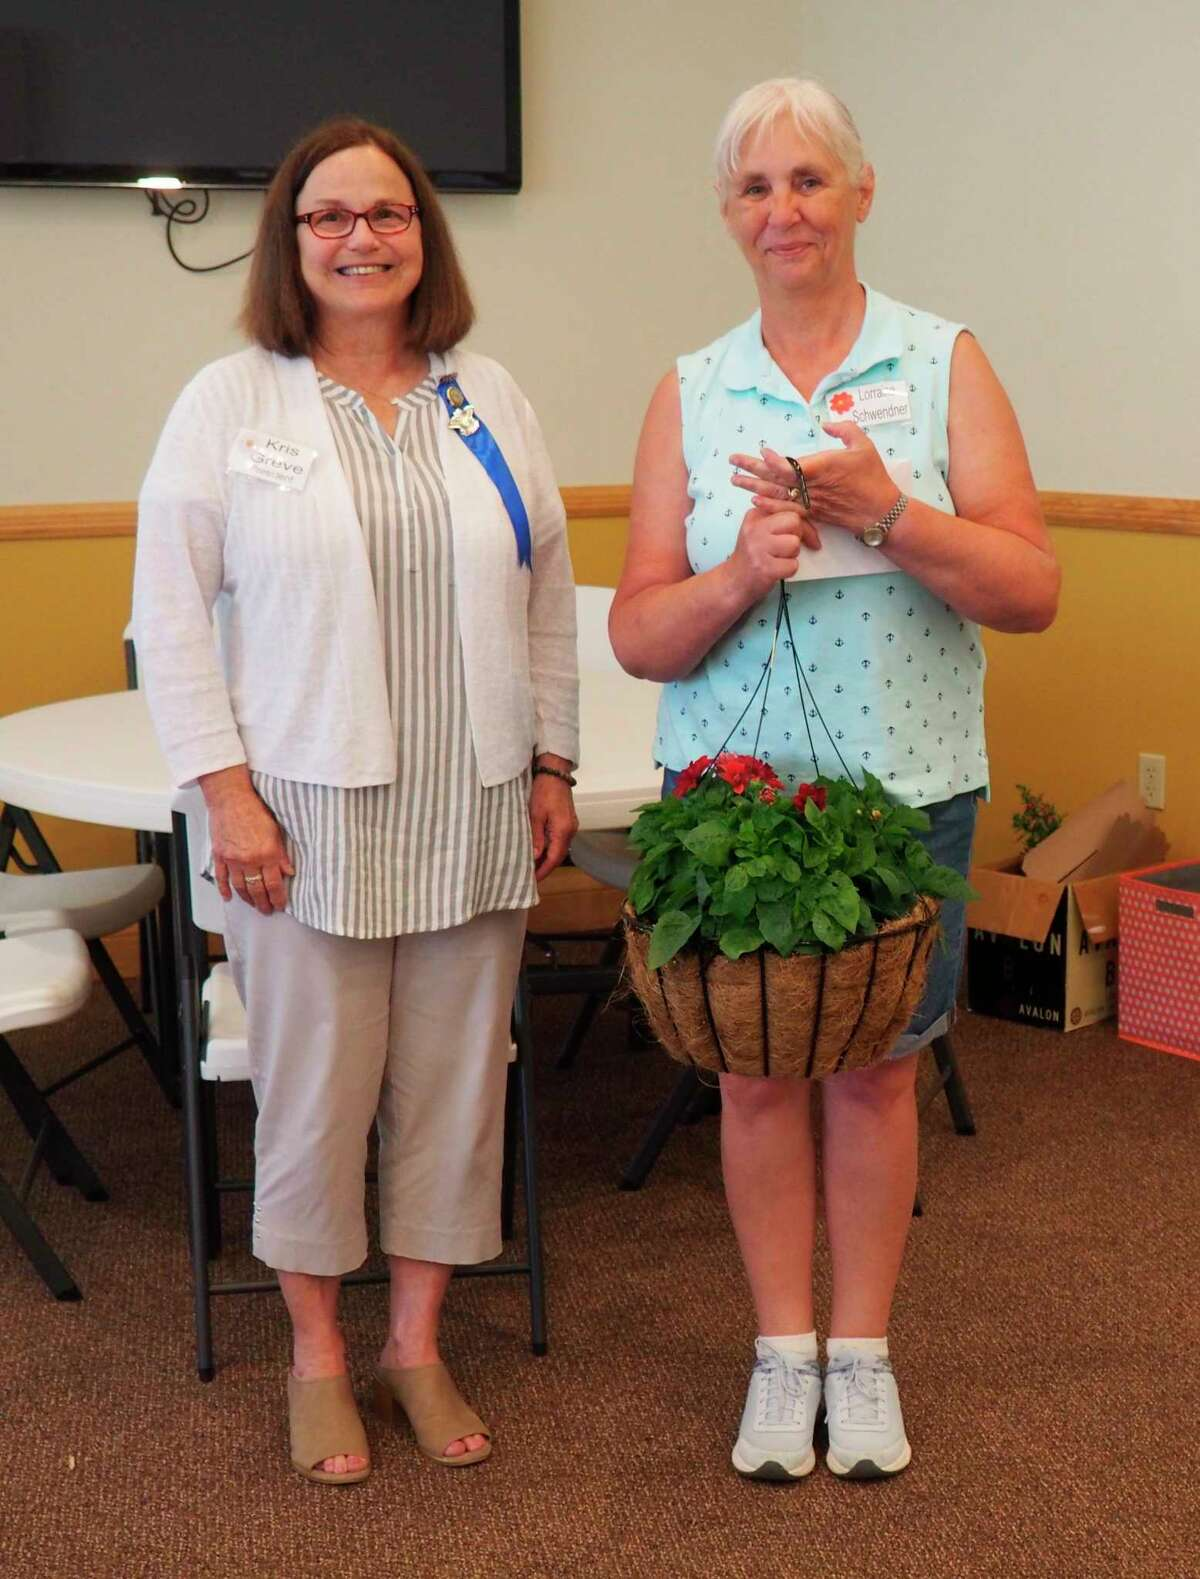 Spirit of the Woods Garden Club recognizedLorraine Schwendner for her service to the club. Pictured arepresident Kris Greve and former president Lorraine Schwendner. (Courtesy photo)